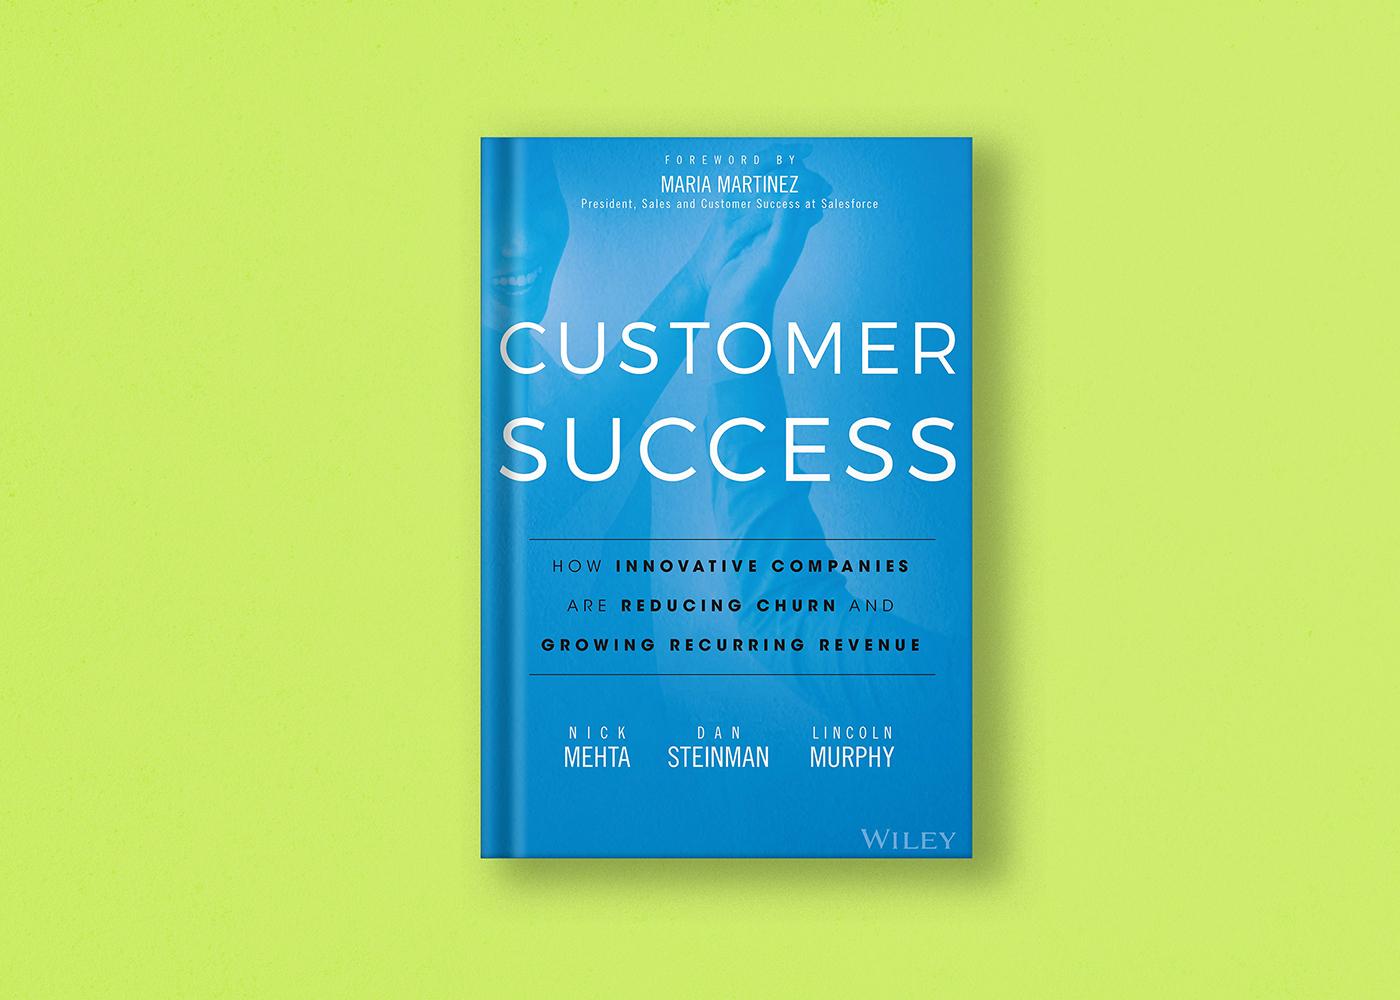 Customer Success book